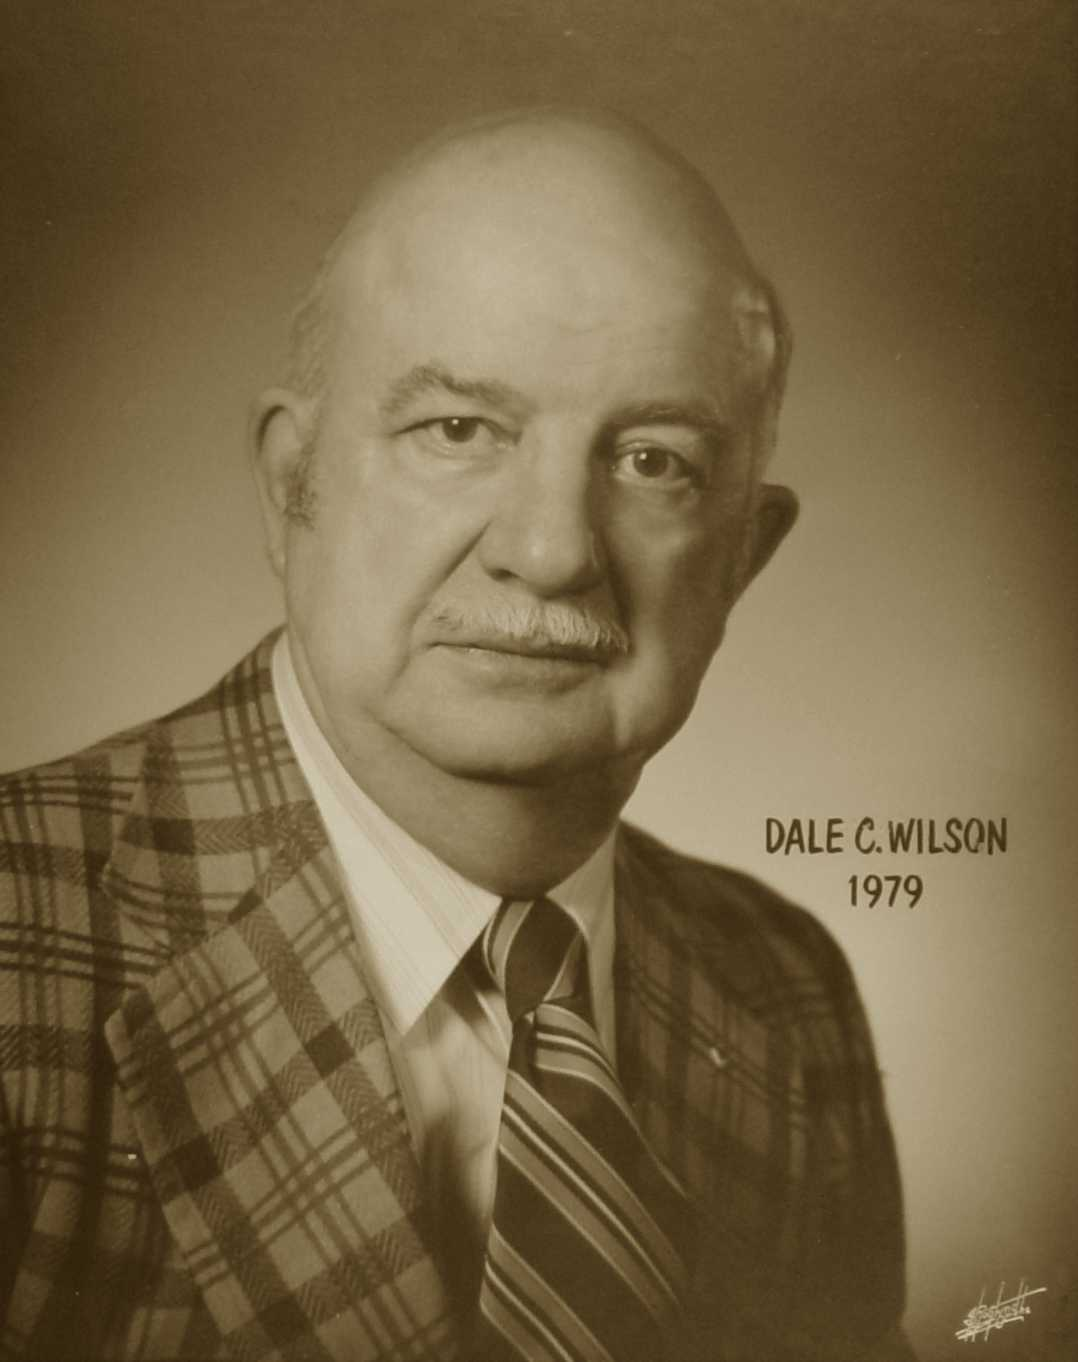 Dale C. Wilson, 1979